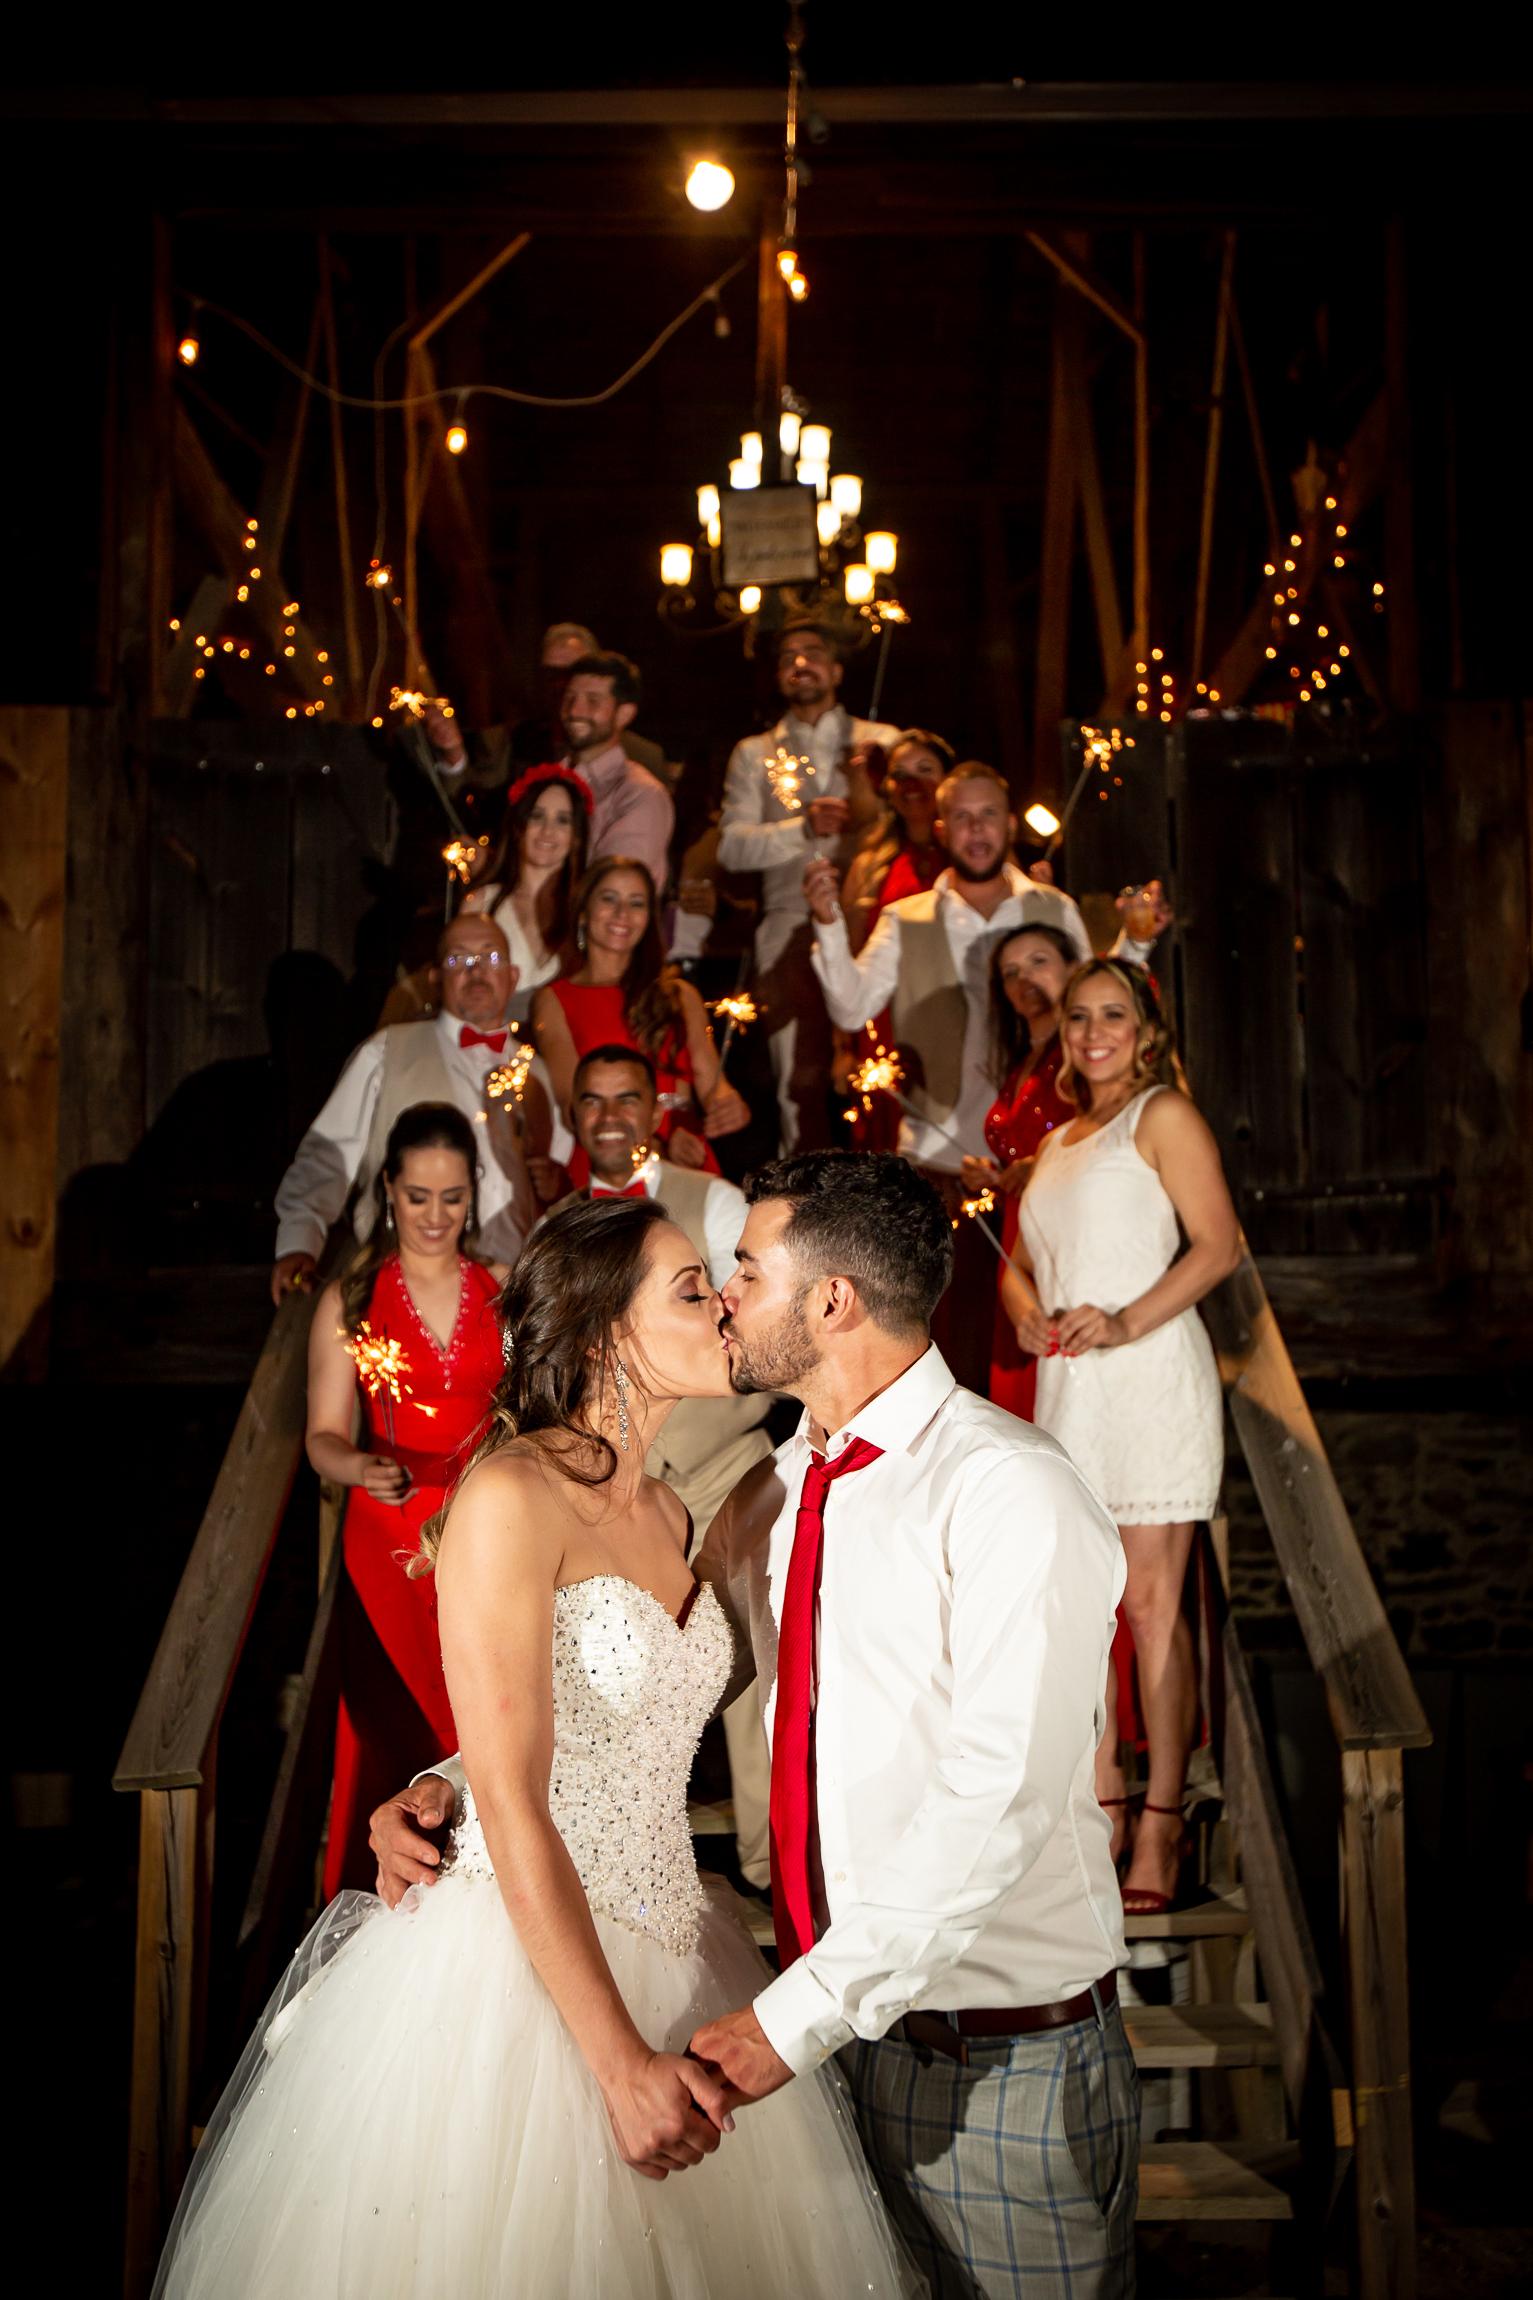 Toronto-wedding-Photograper-129.jpg